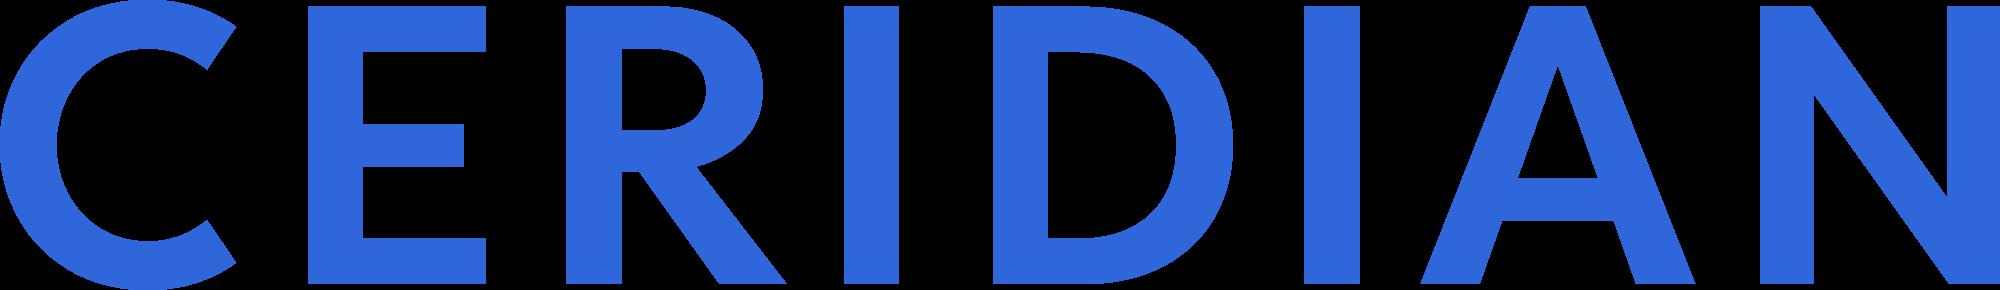 f3491e34-843c-4889-84c1-5f96f8001898Ceridian-Large_logo.png